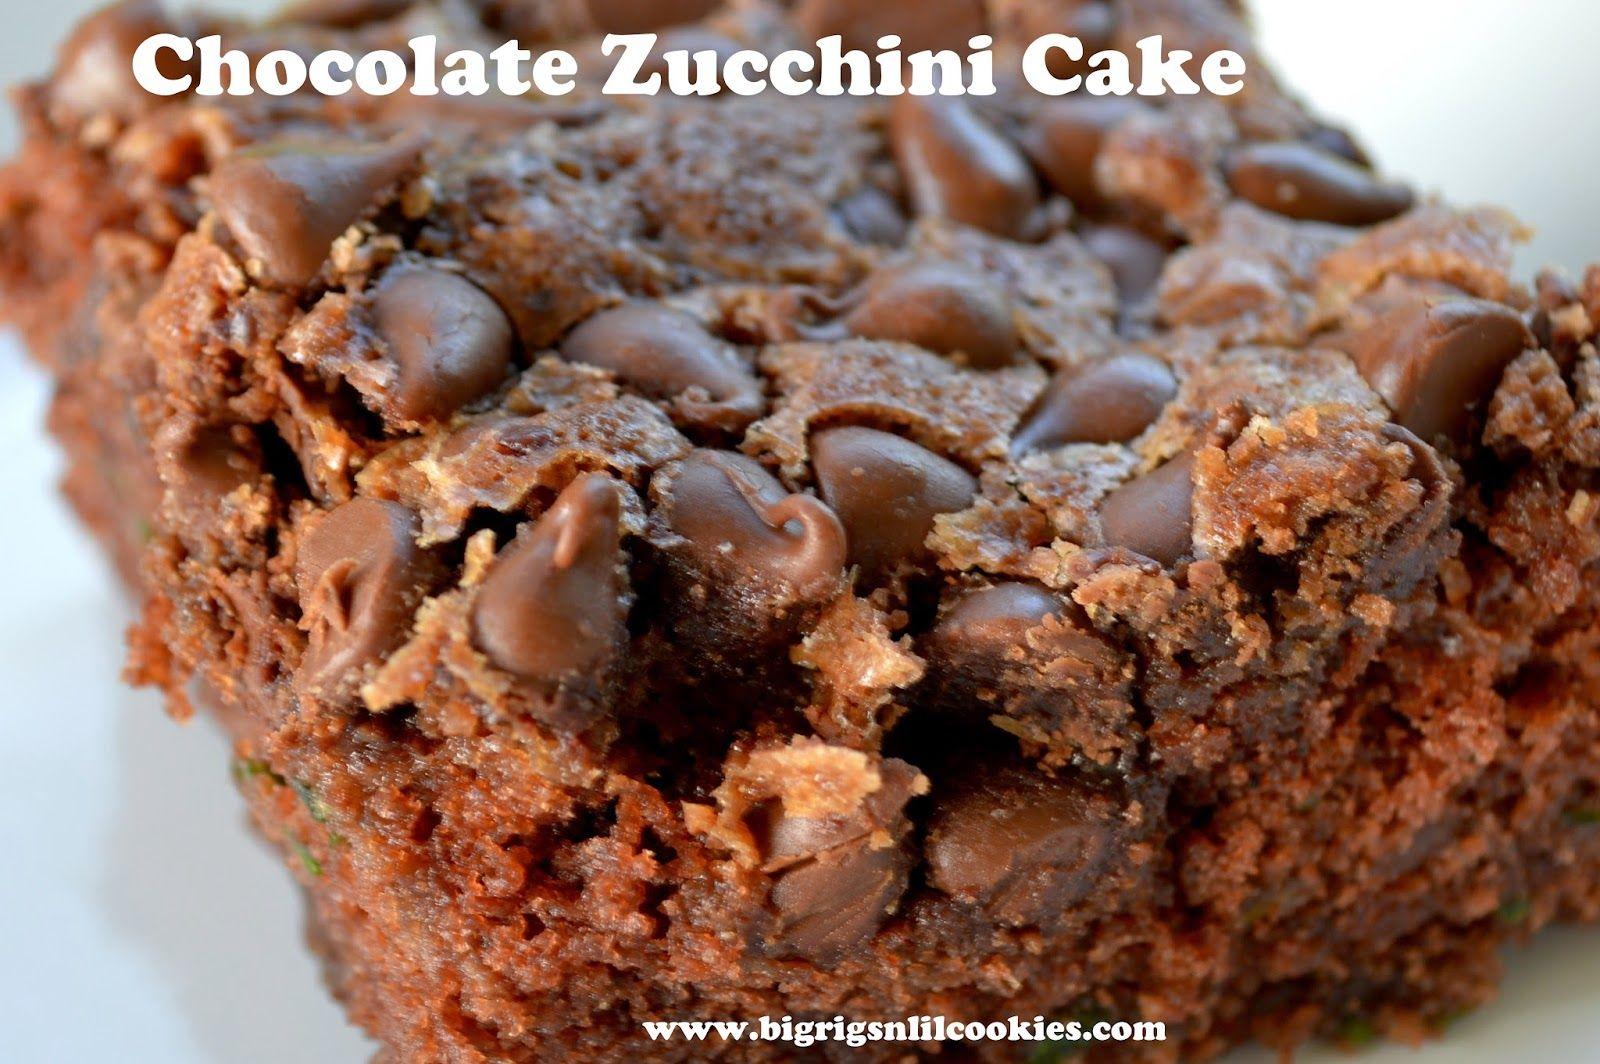 Big Rigs 'n Lil' Cookies: Chocolate Zucchini Cake